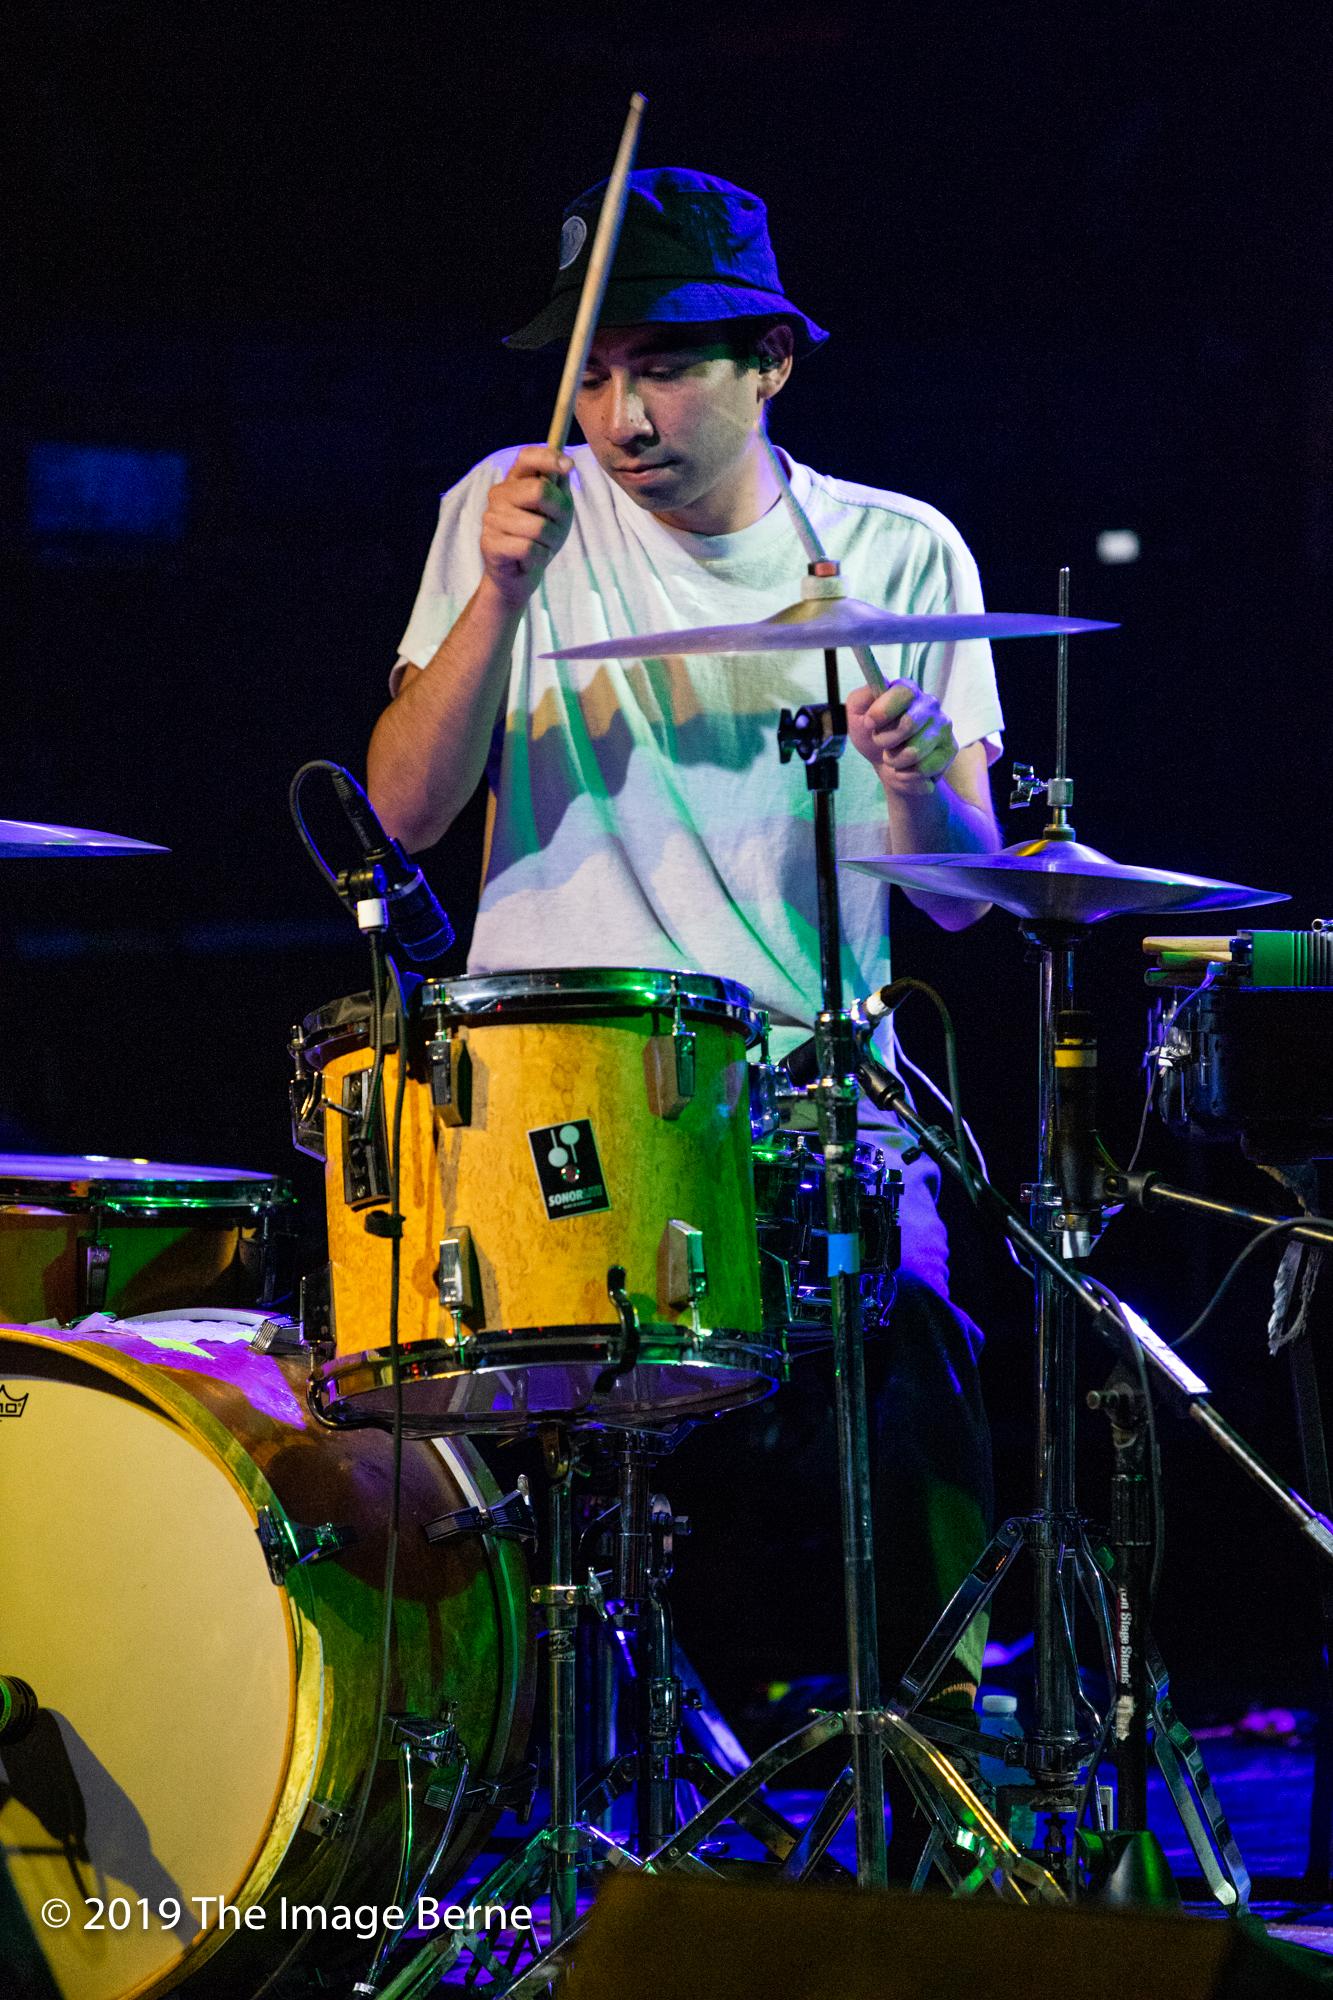 Aaron Gold-004.JPG